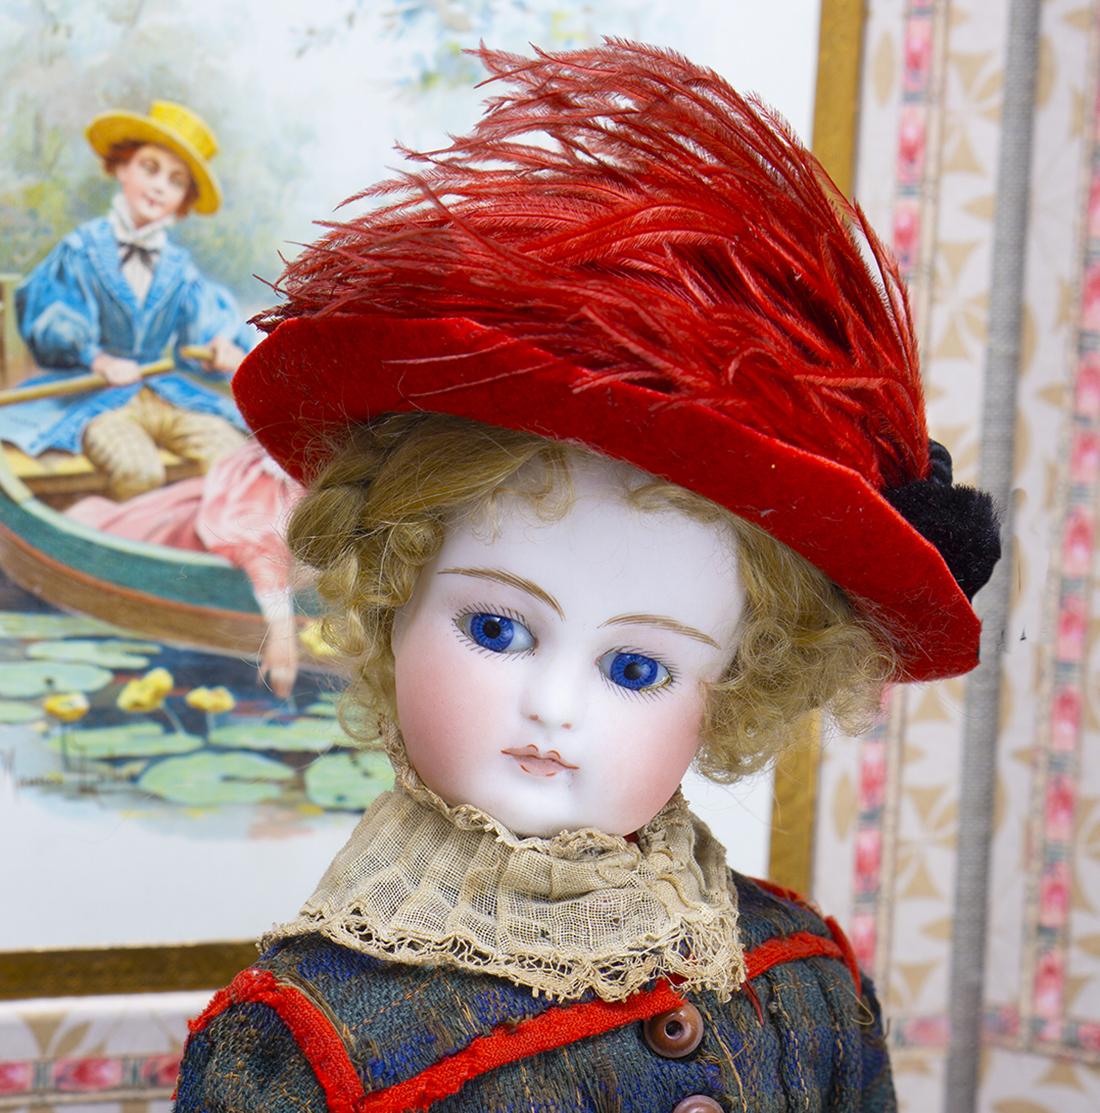 French fashion doll by Barrois